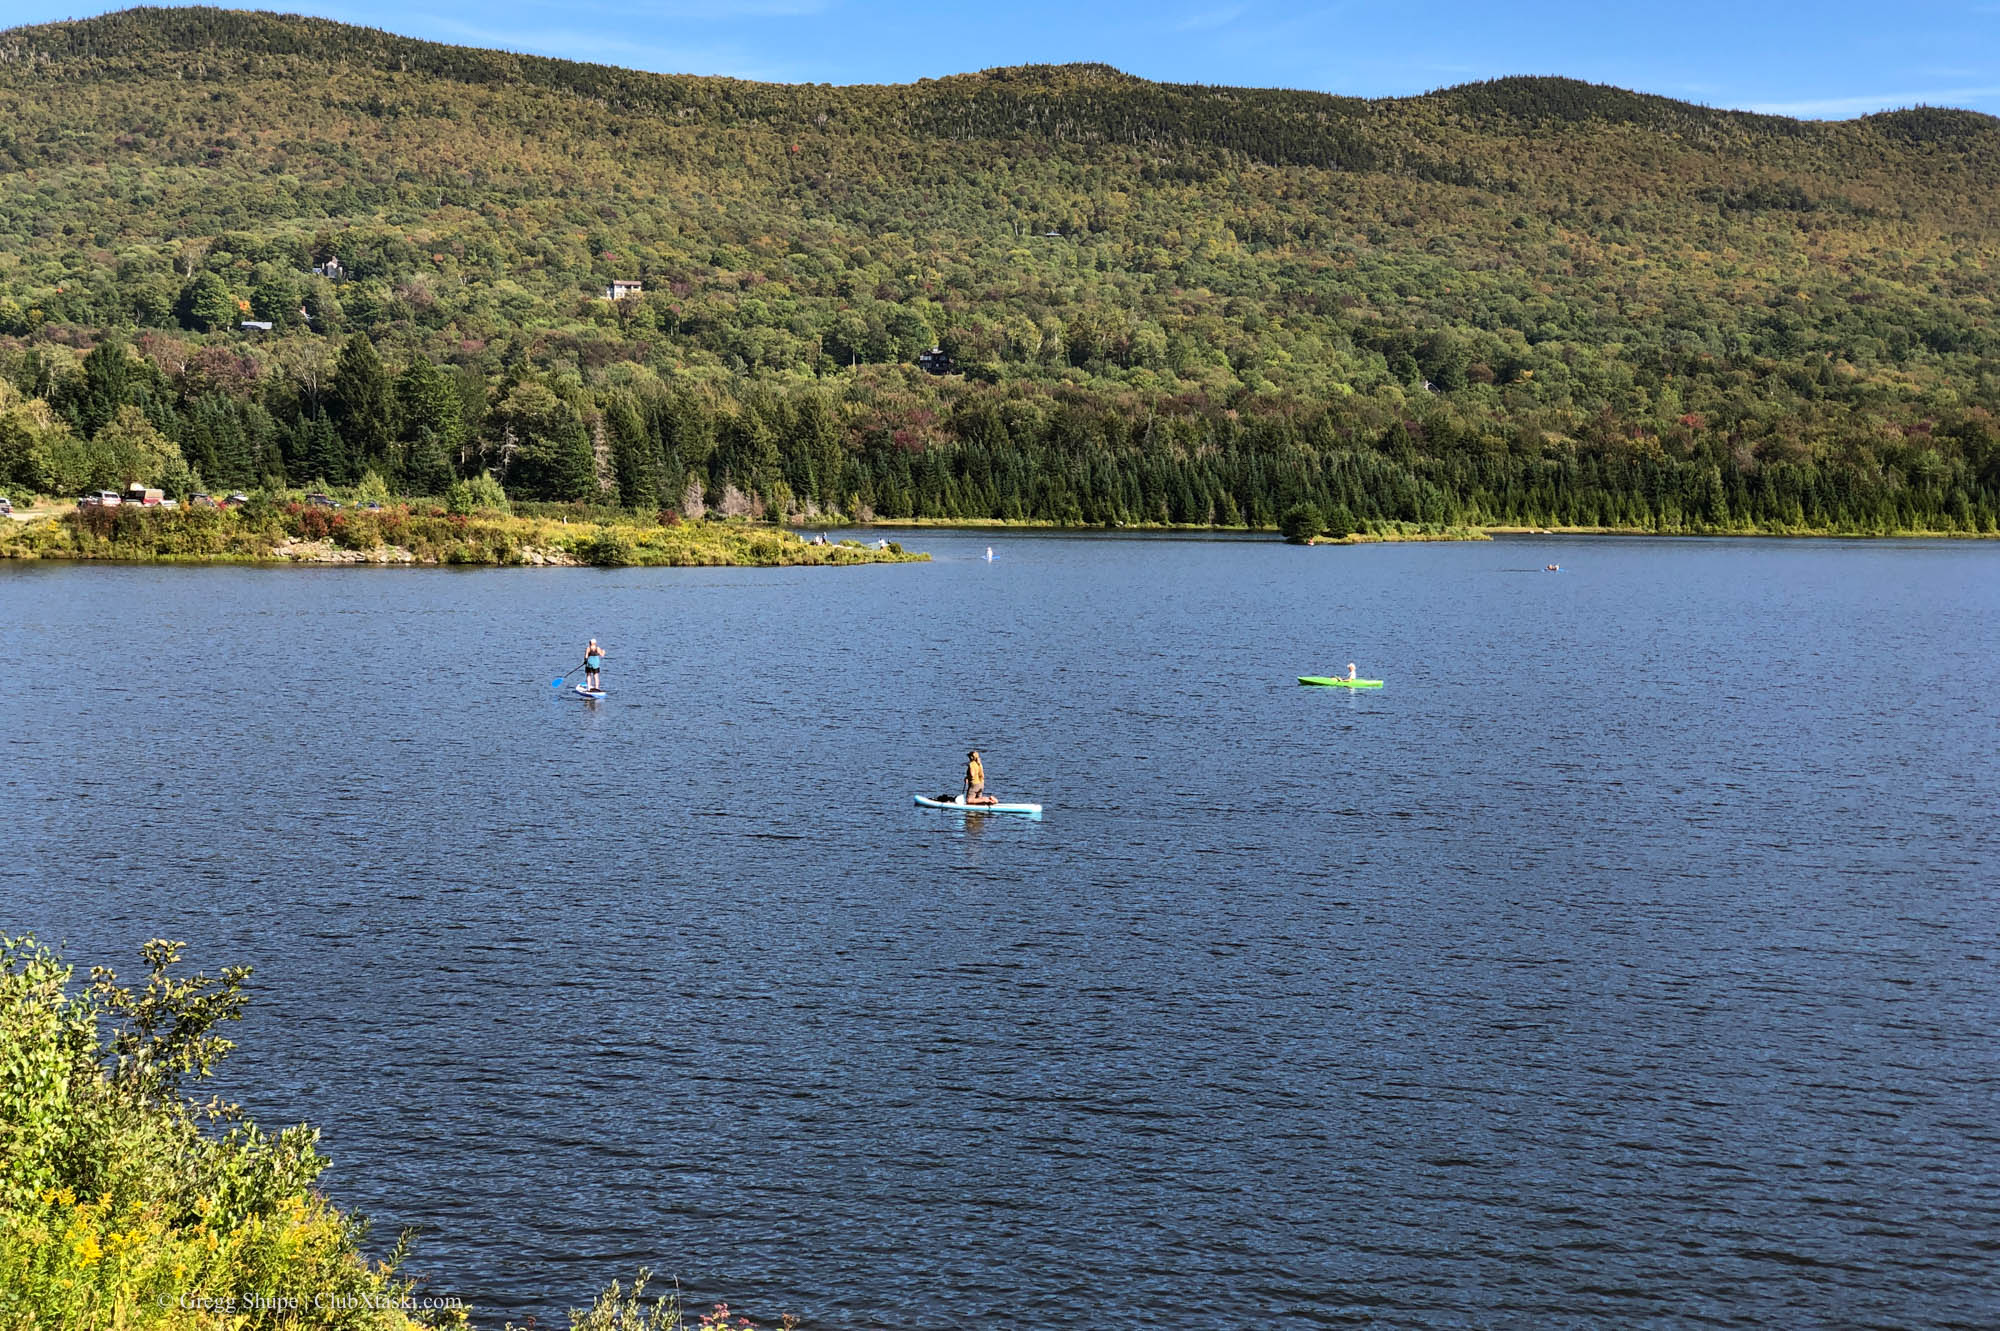 Paddle Board on Blueberry Lake - Warren, VT